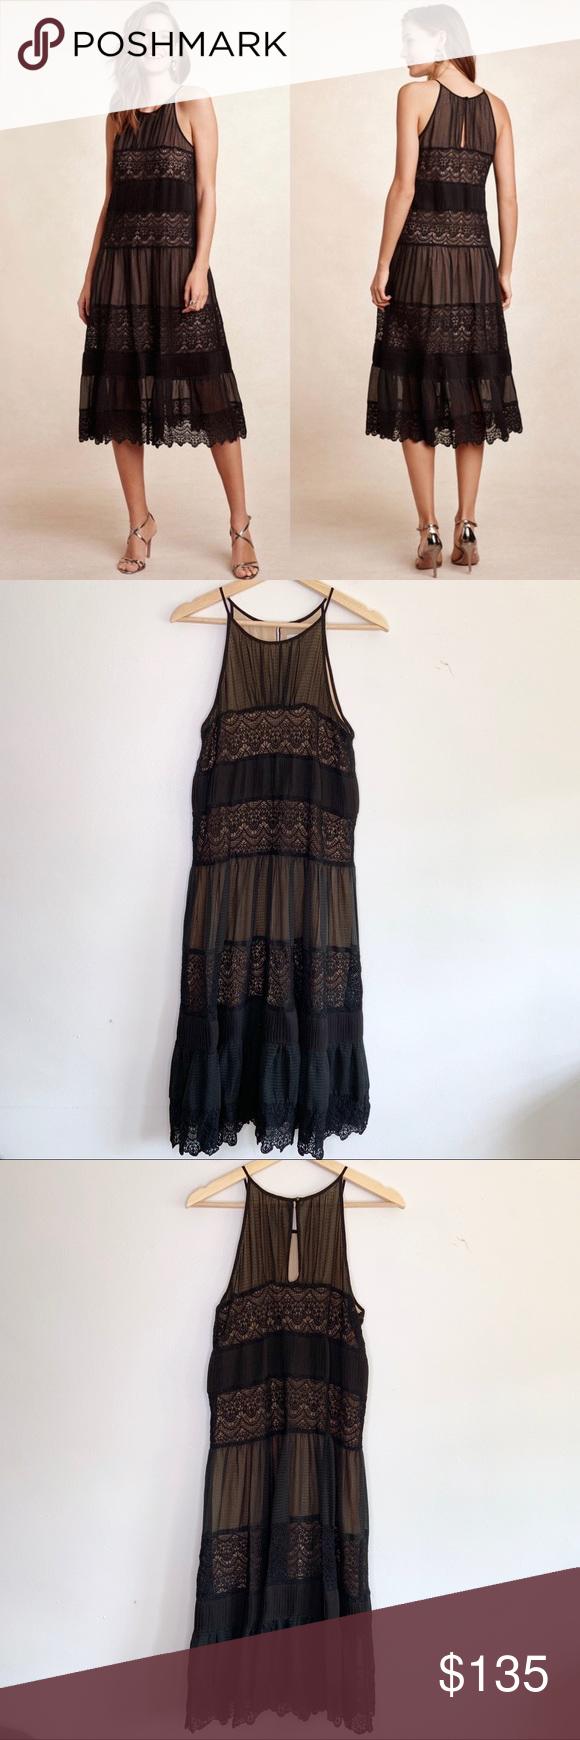 Hd In Paris Villanelle Lace Dress In Black Lace Dress Fashion Anthropologie Dress [ 1740 x 580 Pixel ]